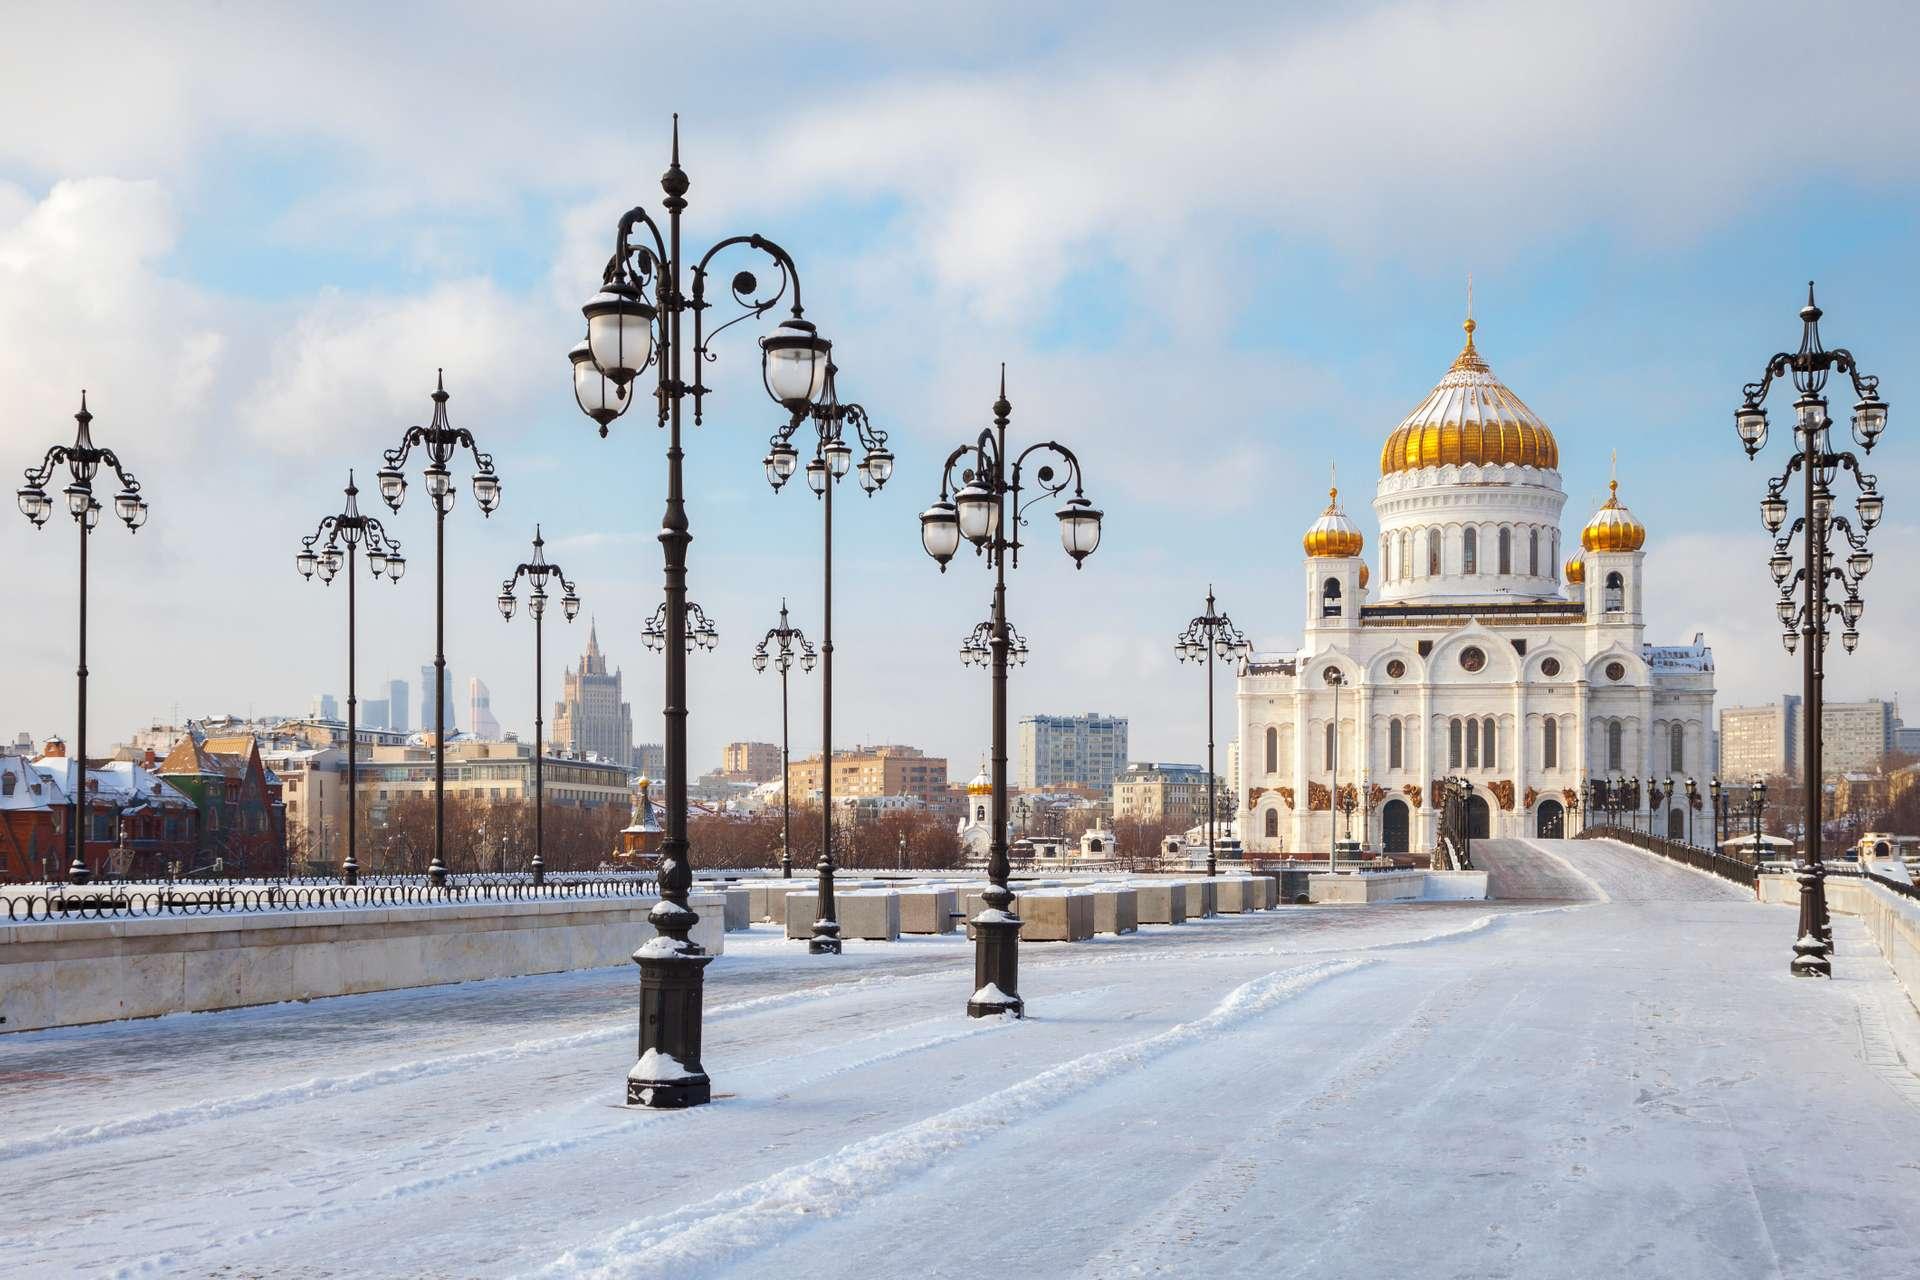 moskou rusland winter sneeuw